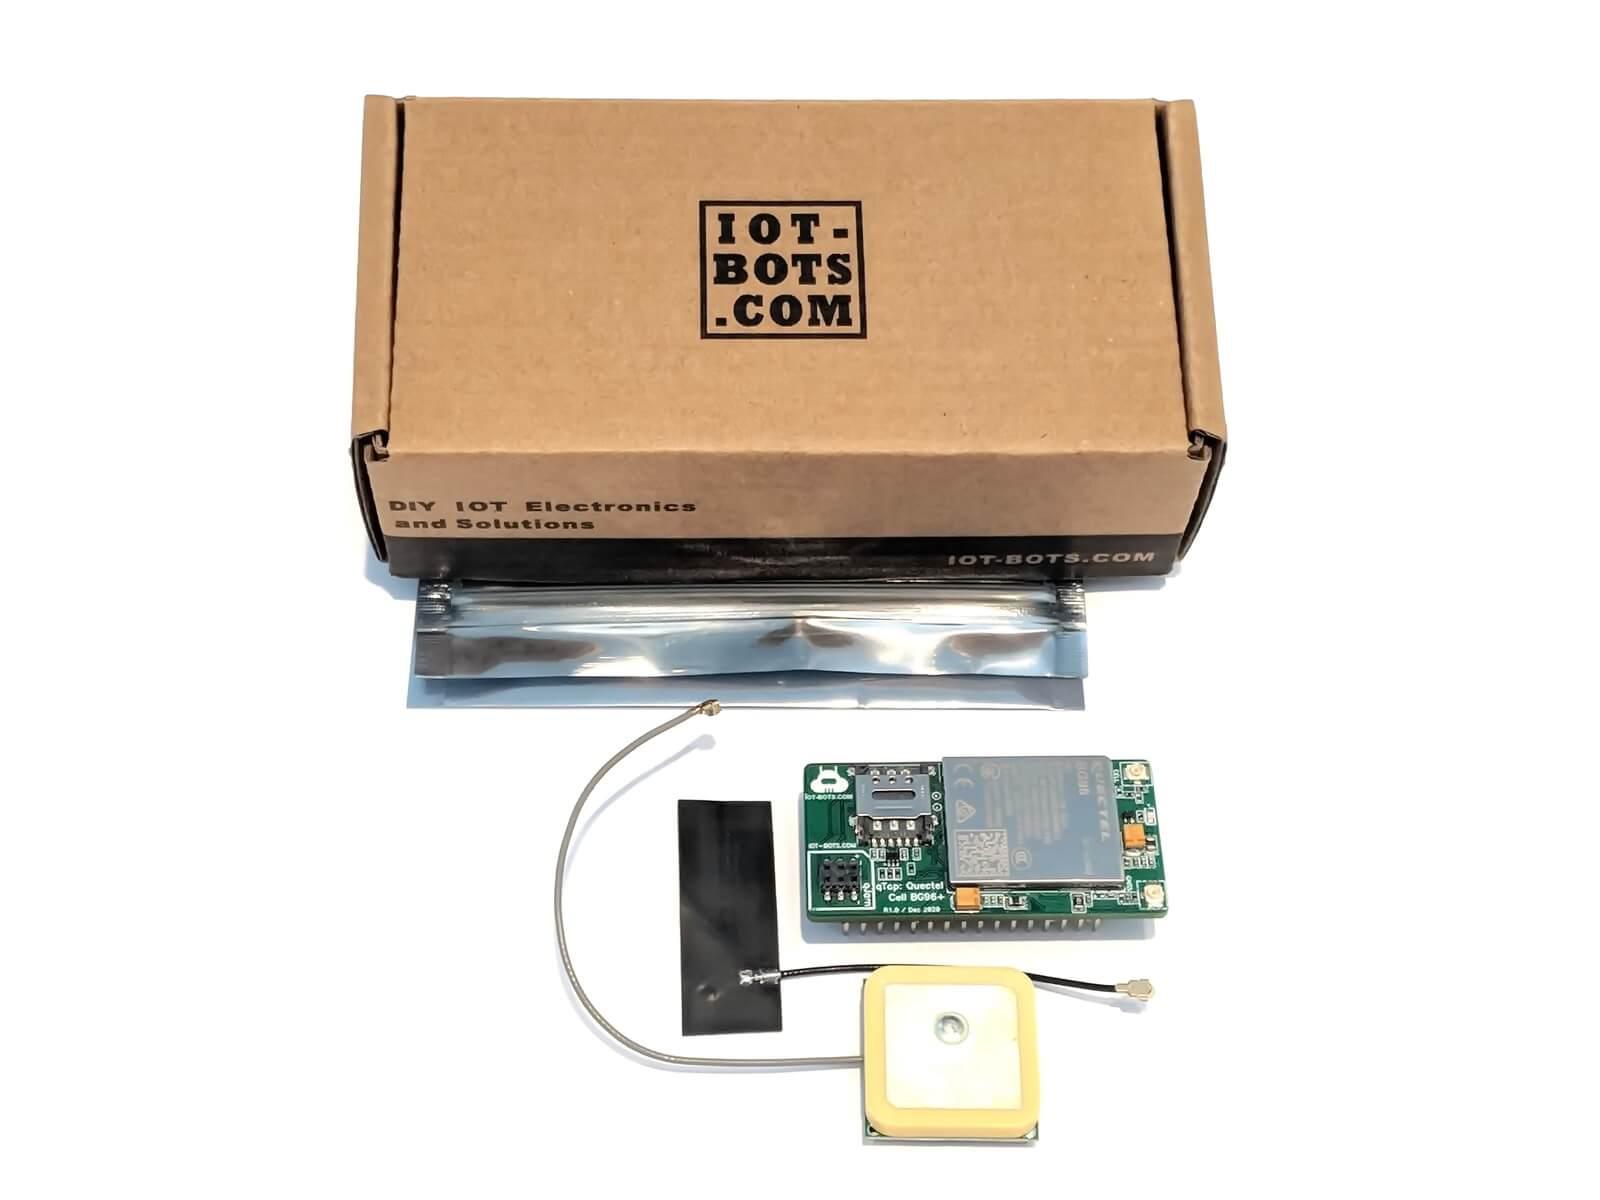 iotbotscom-qtop-cell-quectel-bg96-afc-packaging